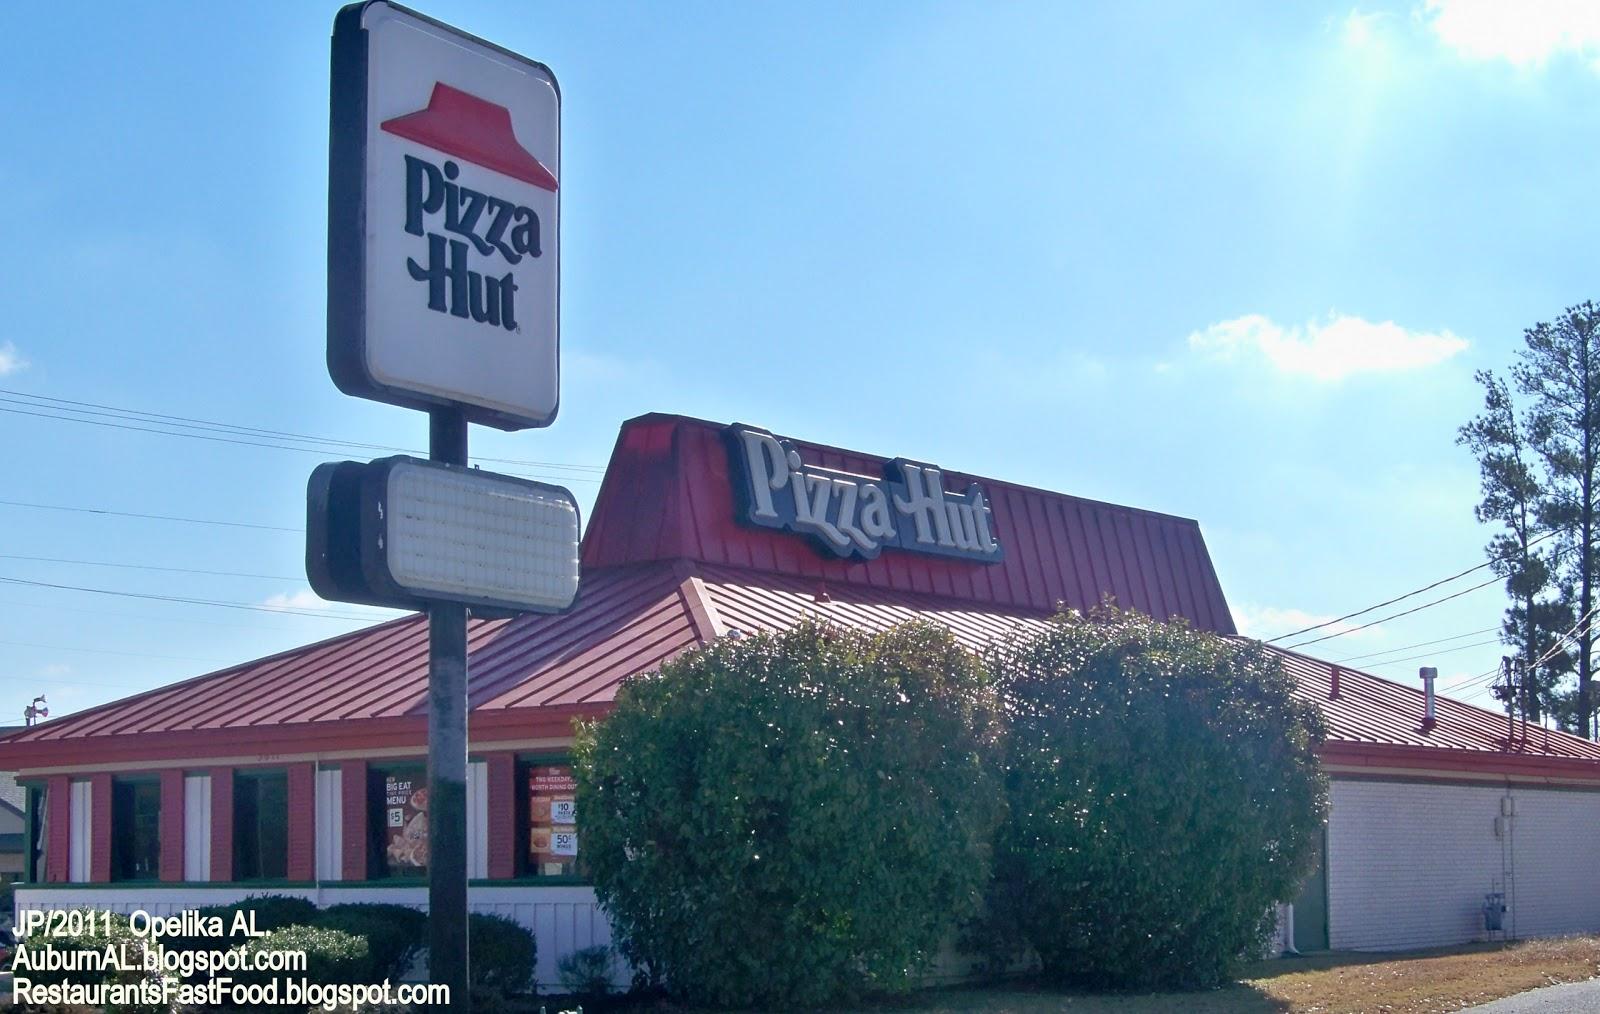 Alabama lee county salem - Pizza Hut Opelika Alabama Pizza Hut Delivery Restaurant Opelika Lee County Auburn Al Pasta Pizza Pies